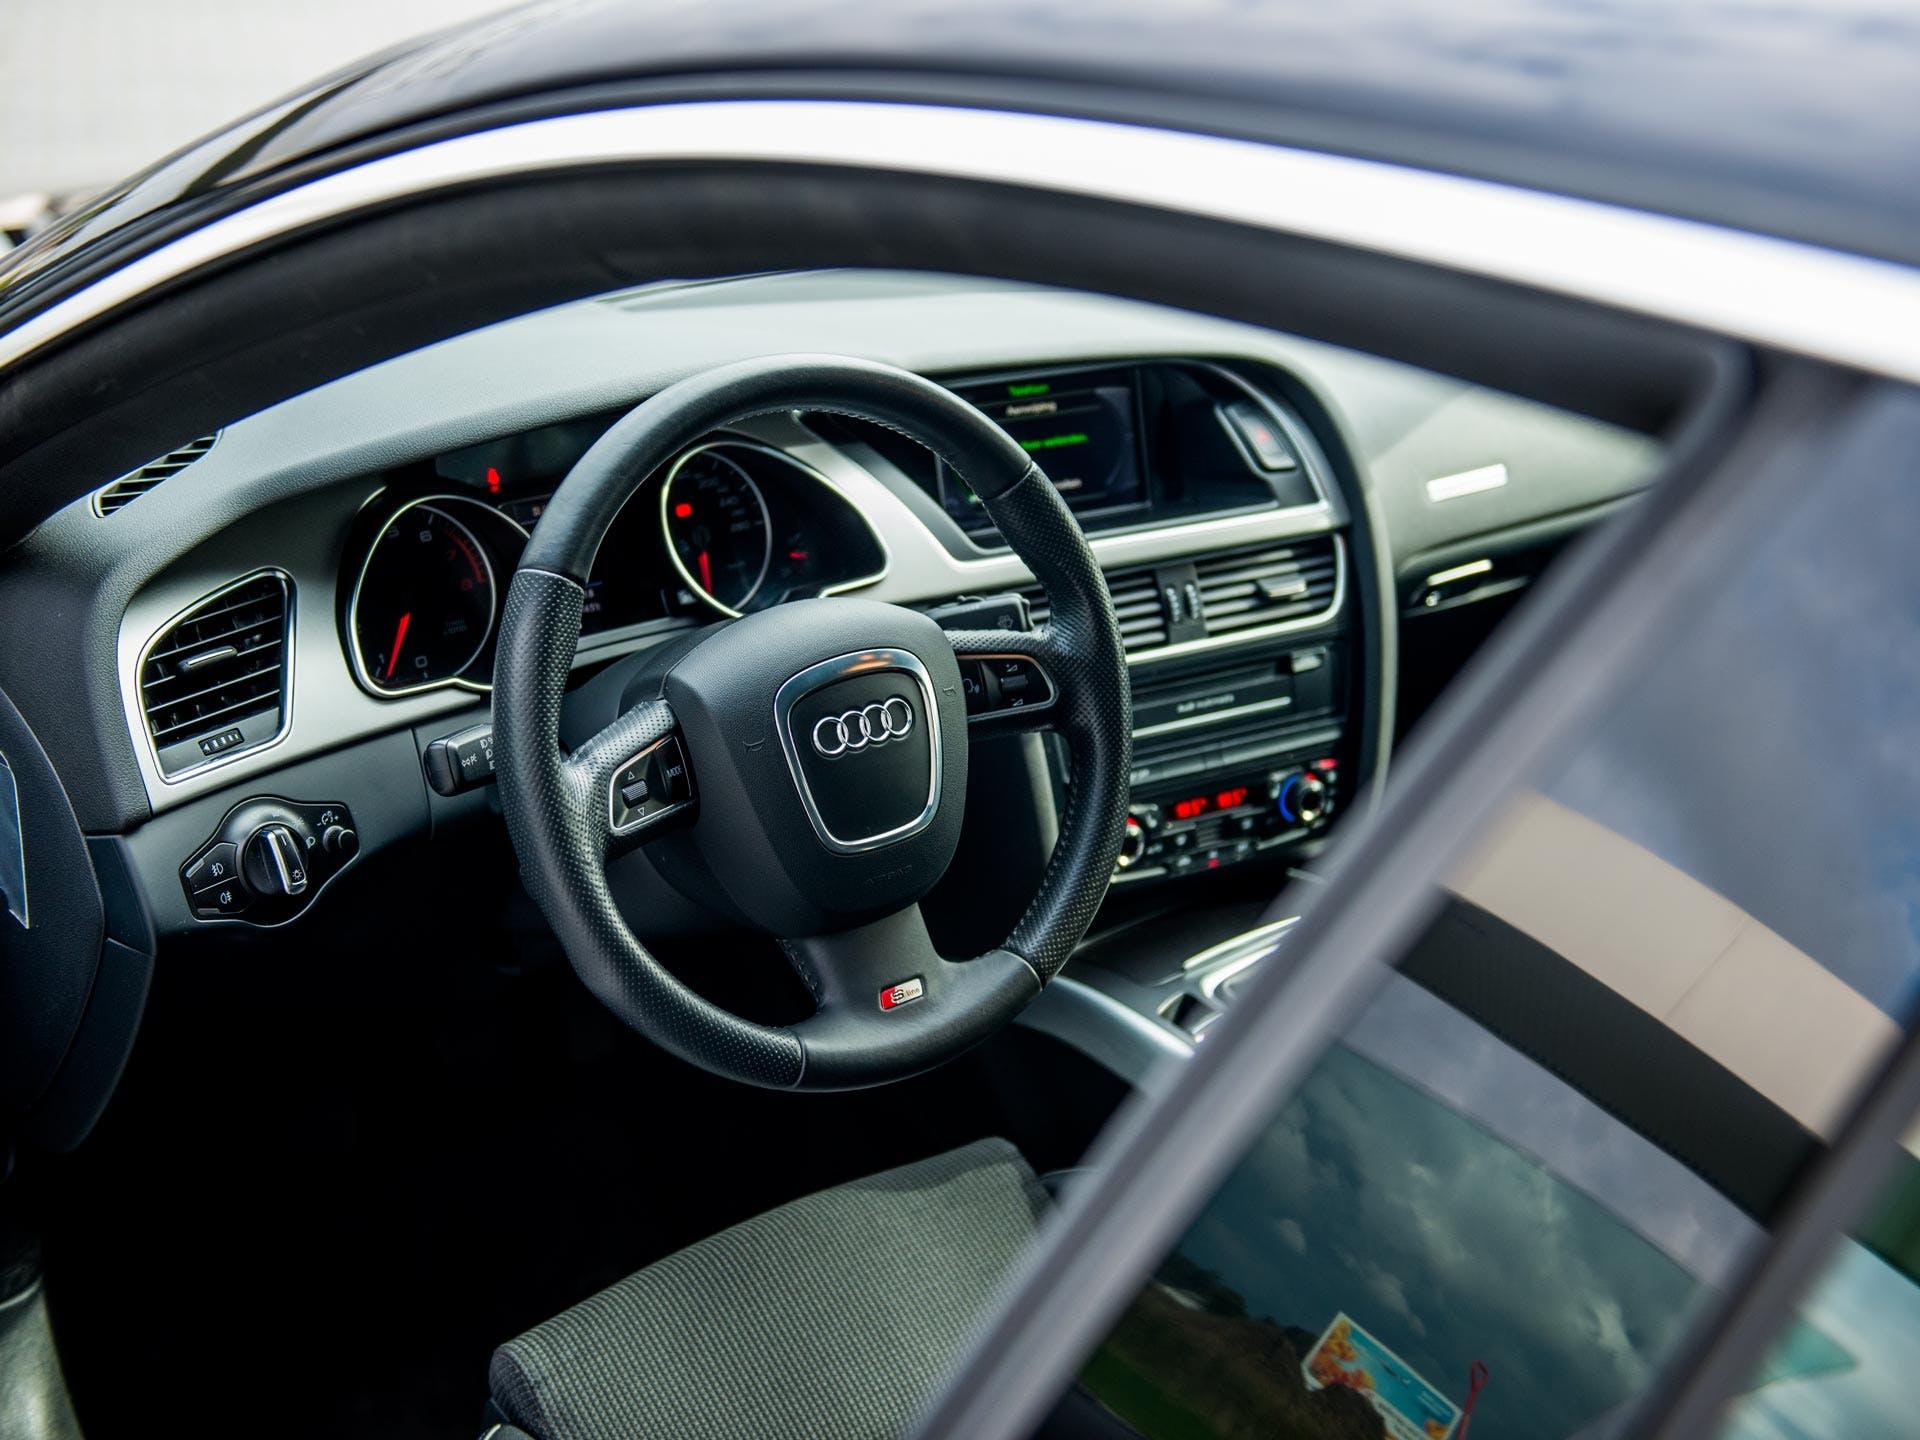 Tweedehands Audi A5 Sportback 2009 occasion